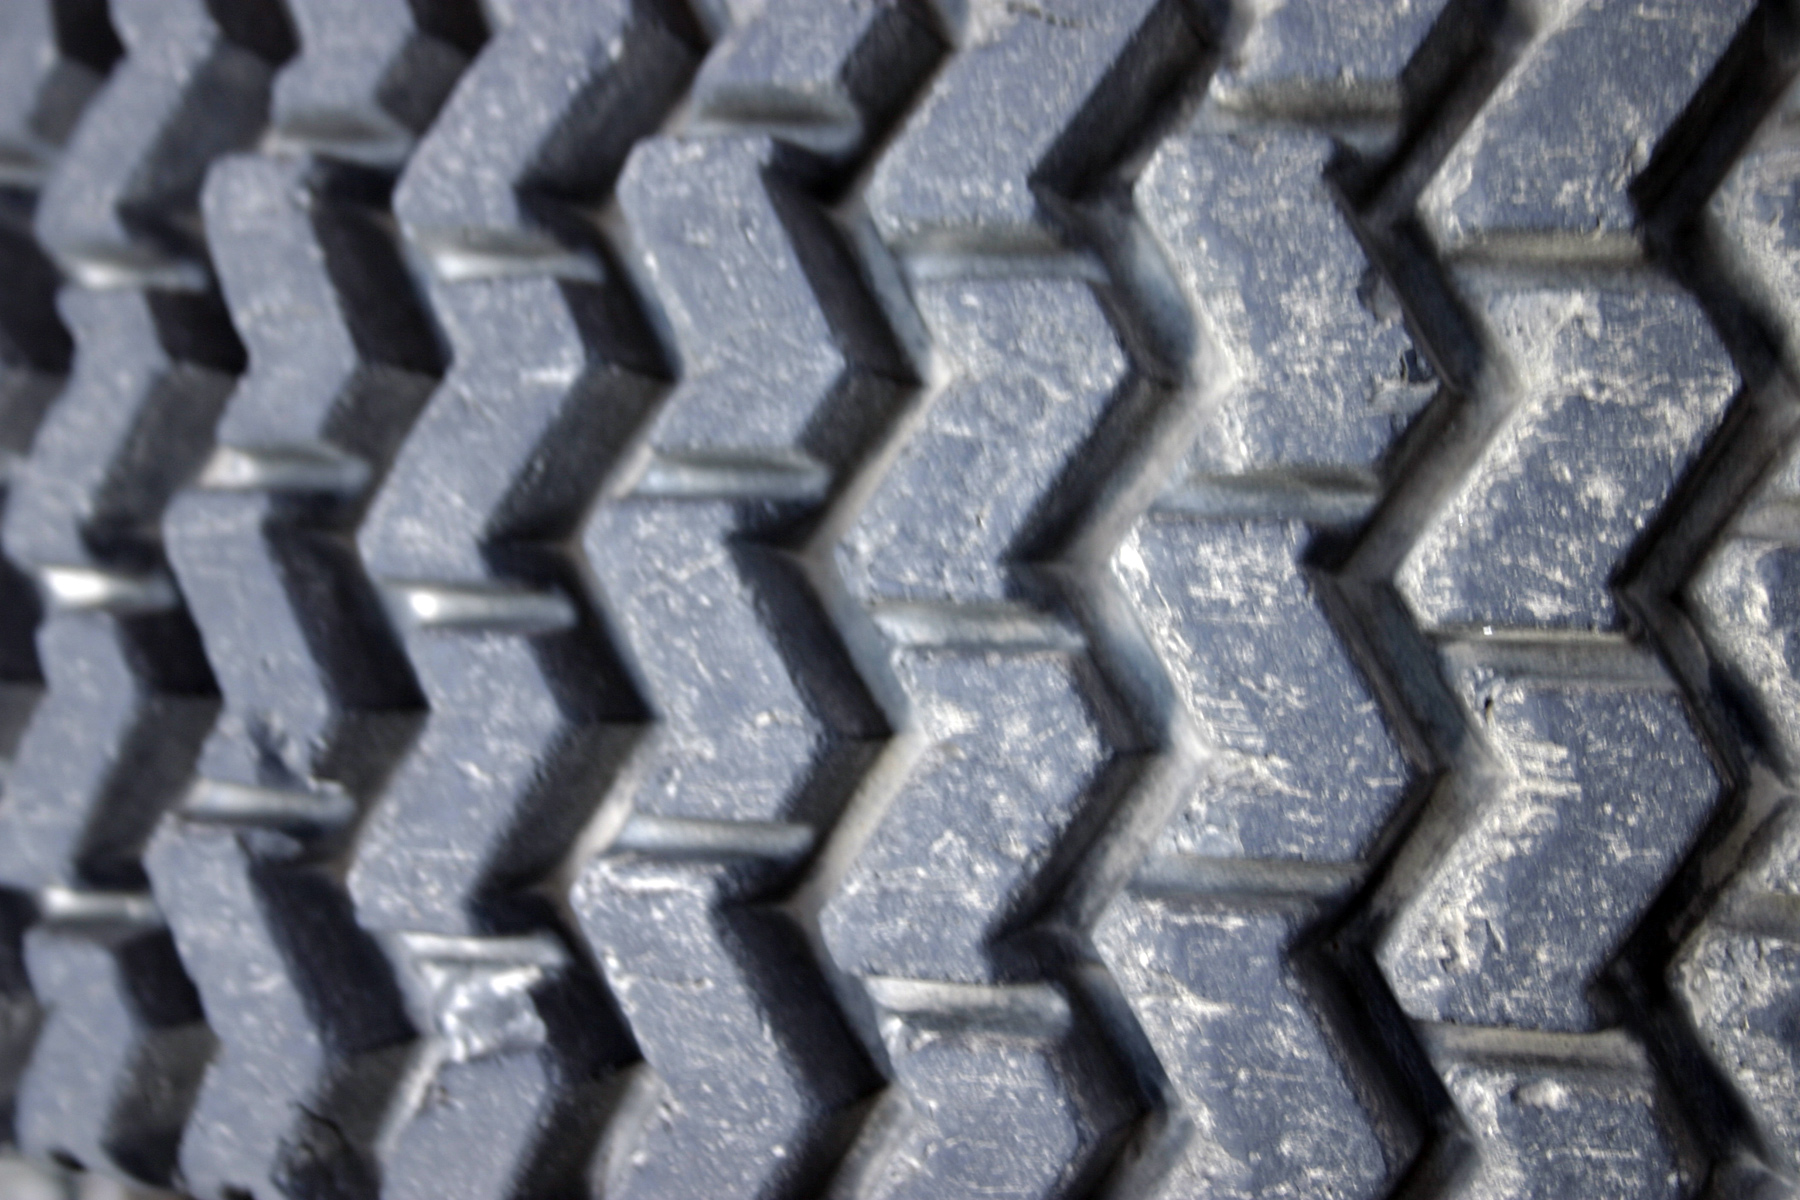 Tire pattern, Rubber, Texture, Tile, Tire, HQ Photo